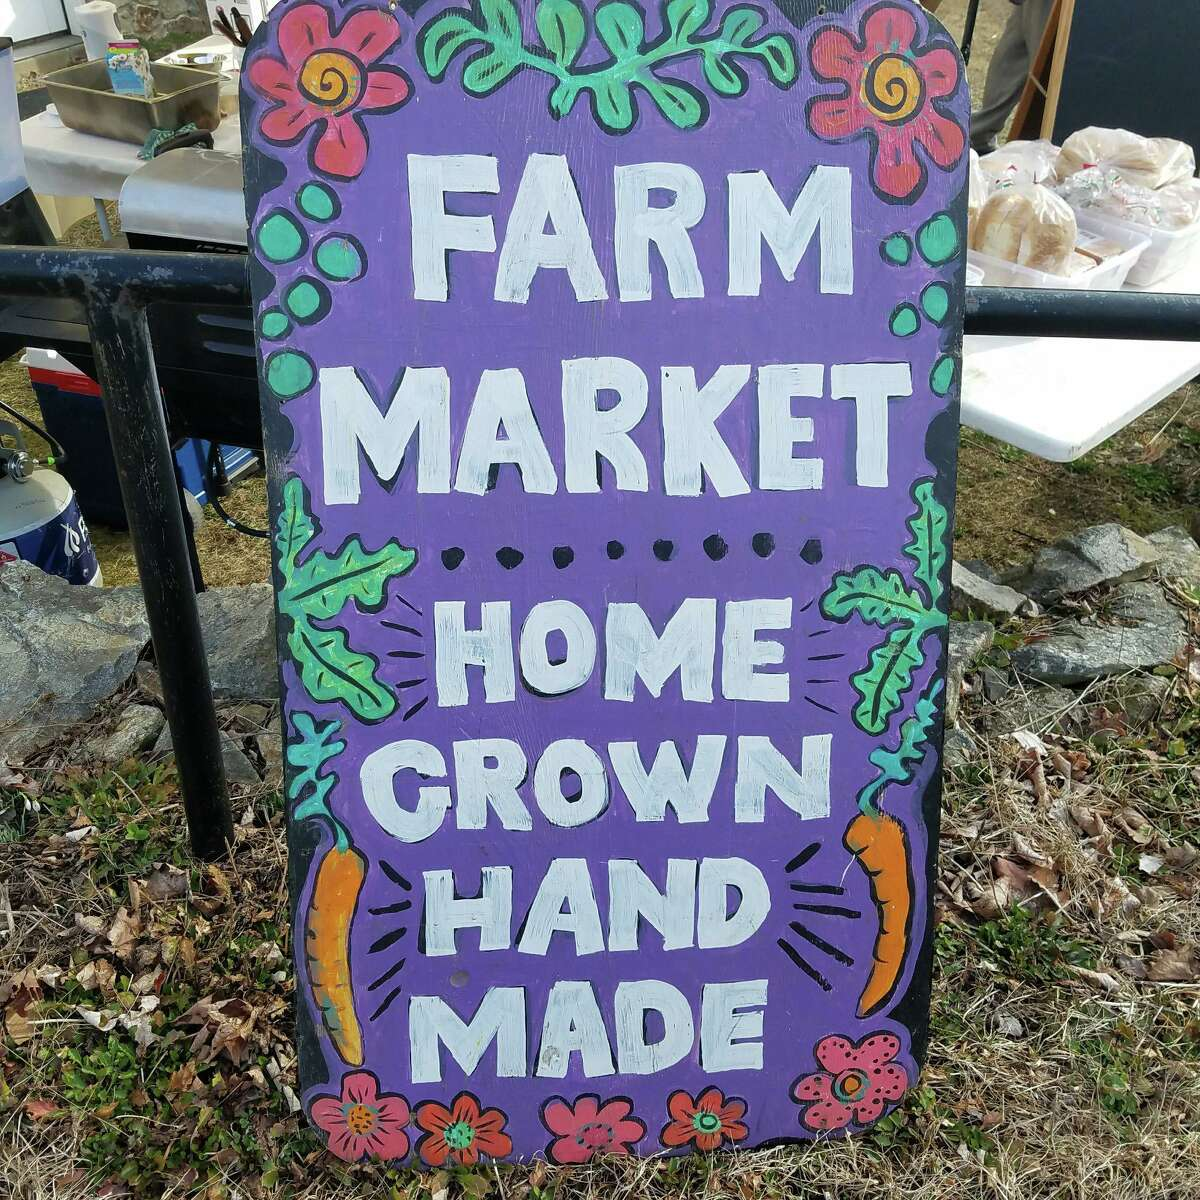 Dudley Farm summer market will be open each Saturday until Oct. 31, beginning Saturday, June 6.